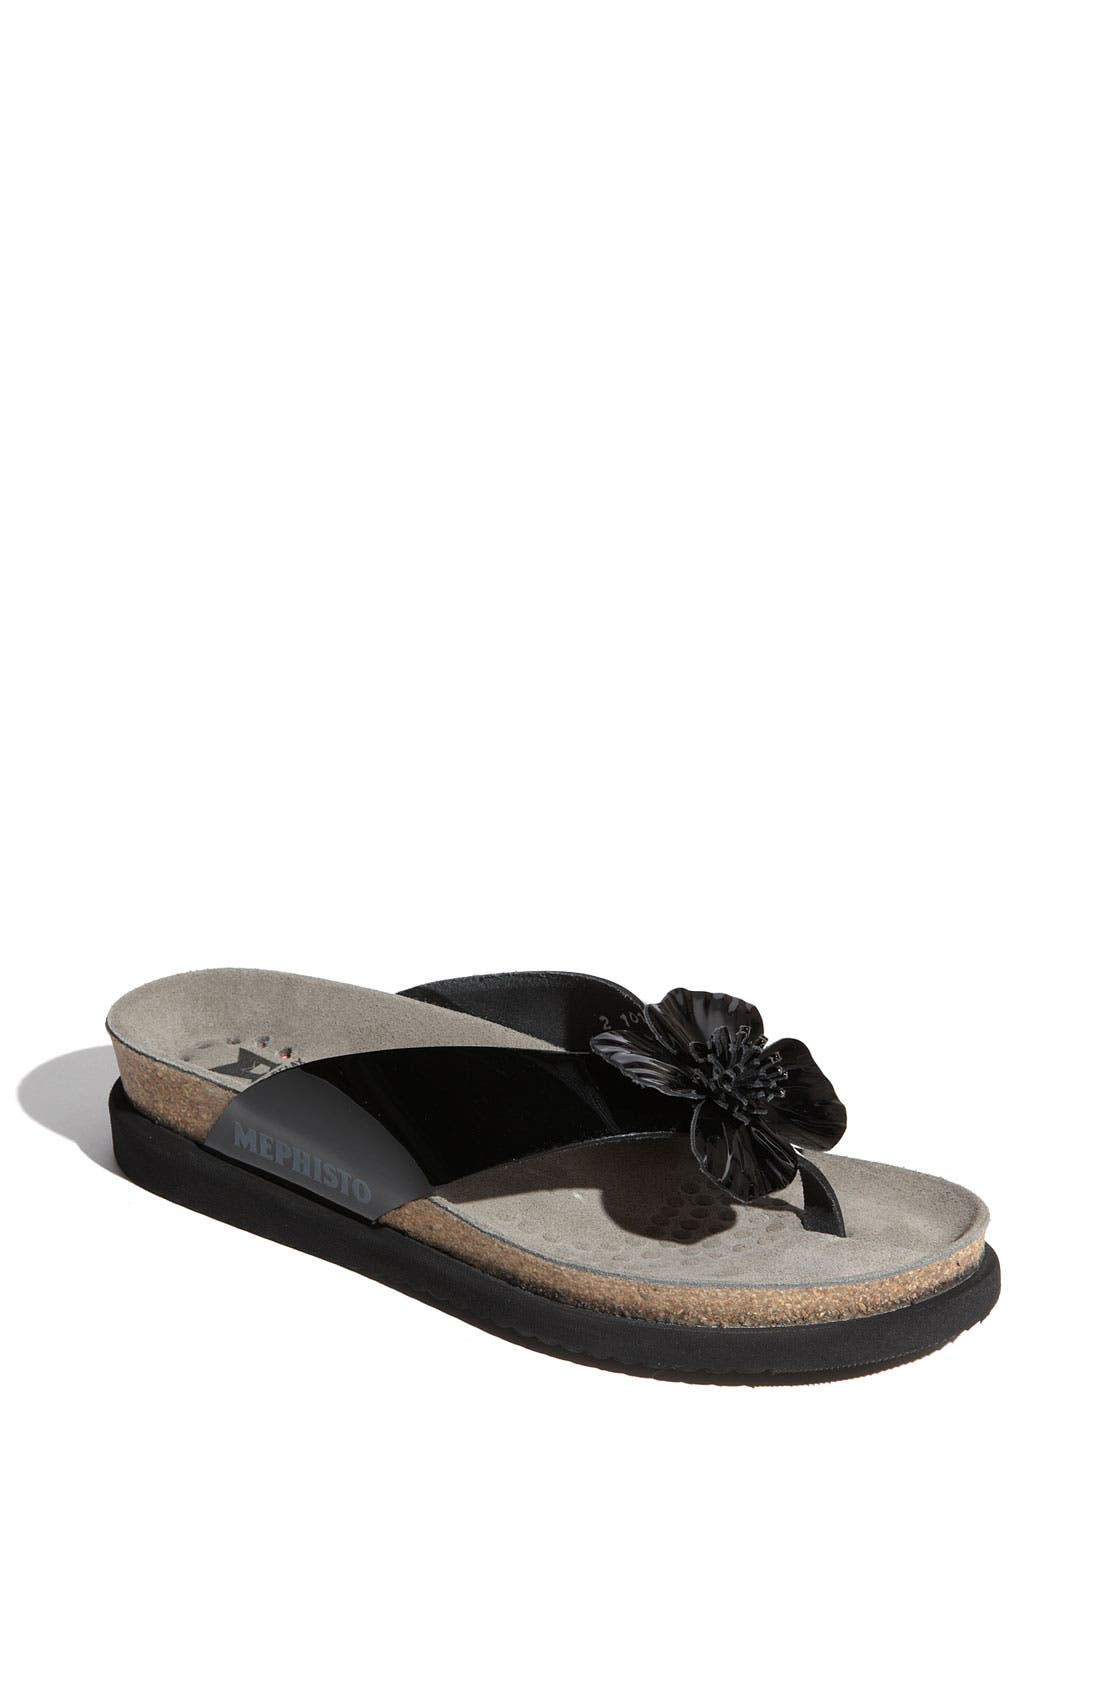 Main Image - Mephisto 'Violette' Thong Sandal